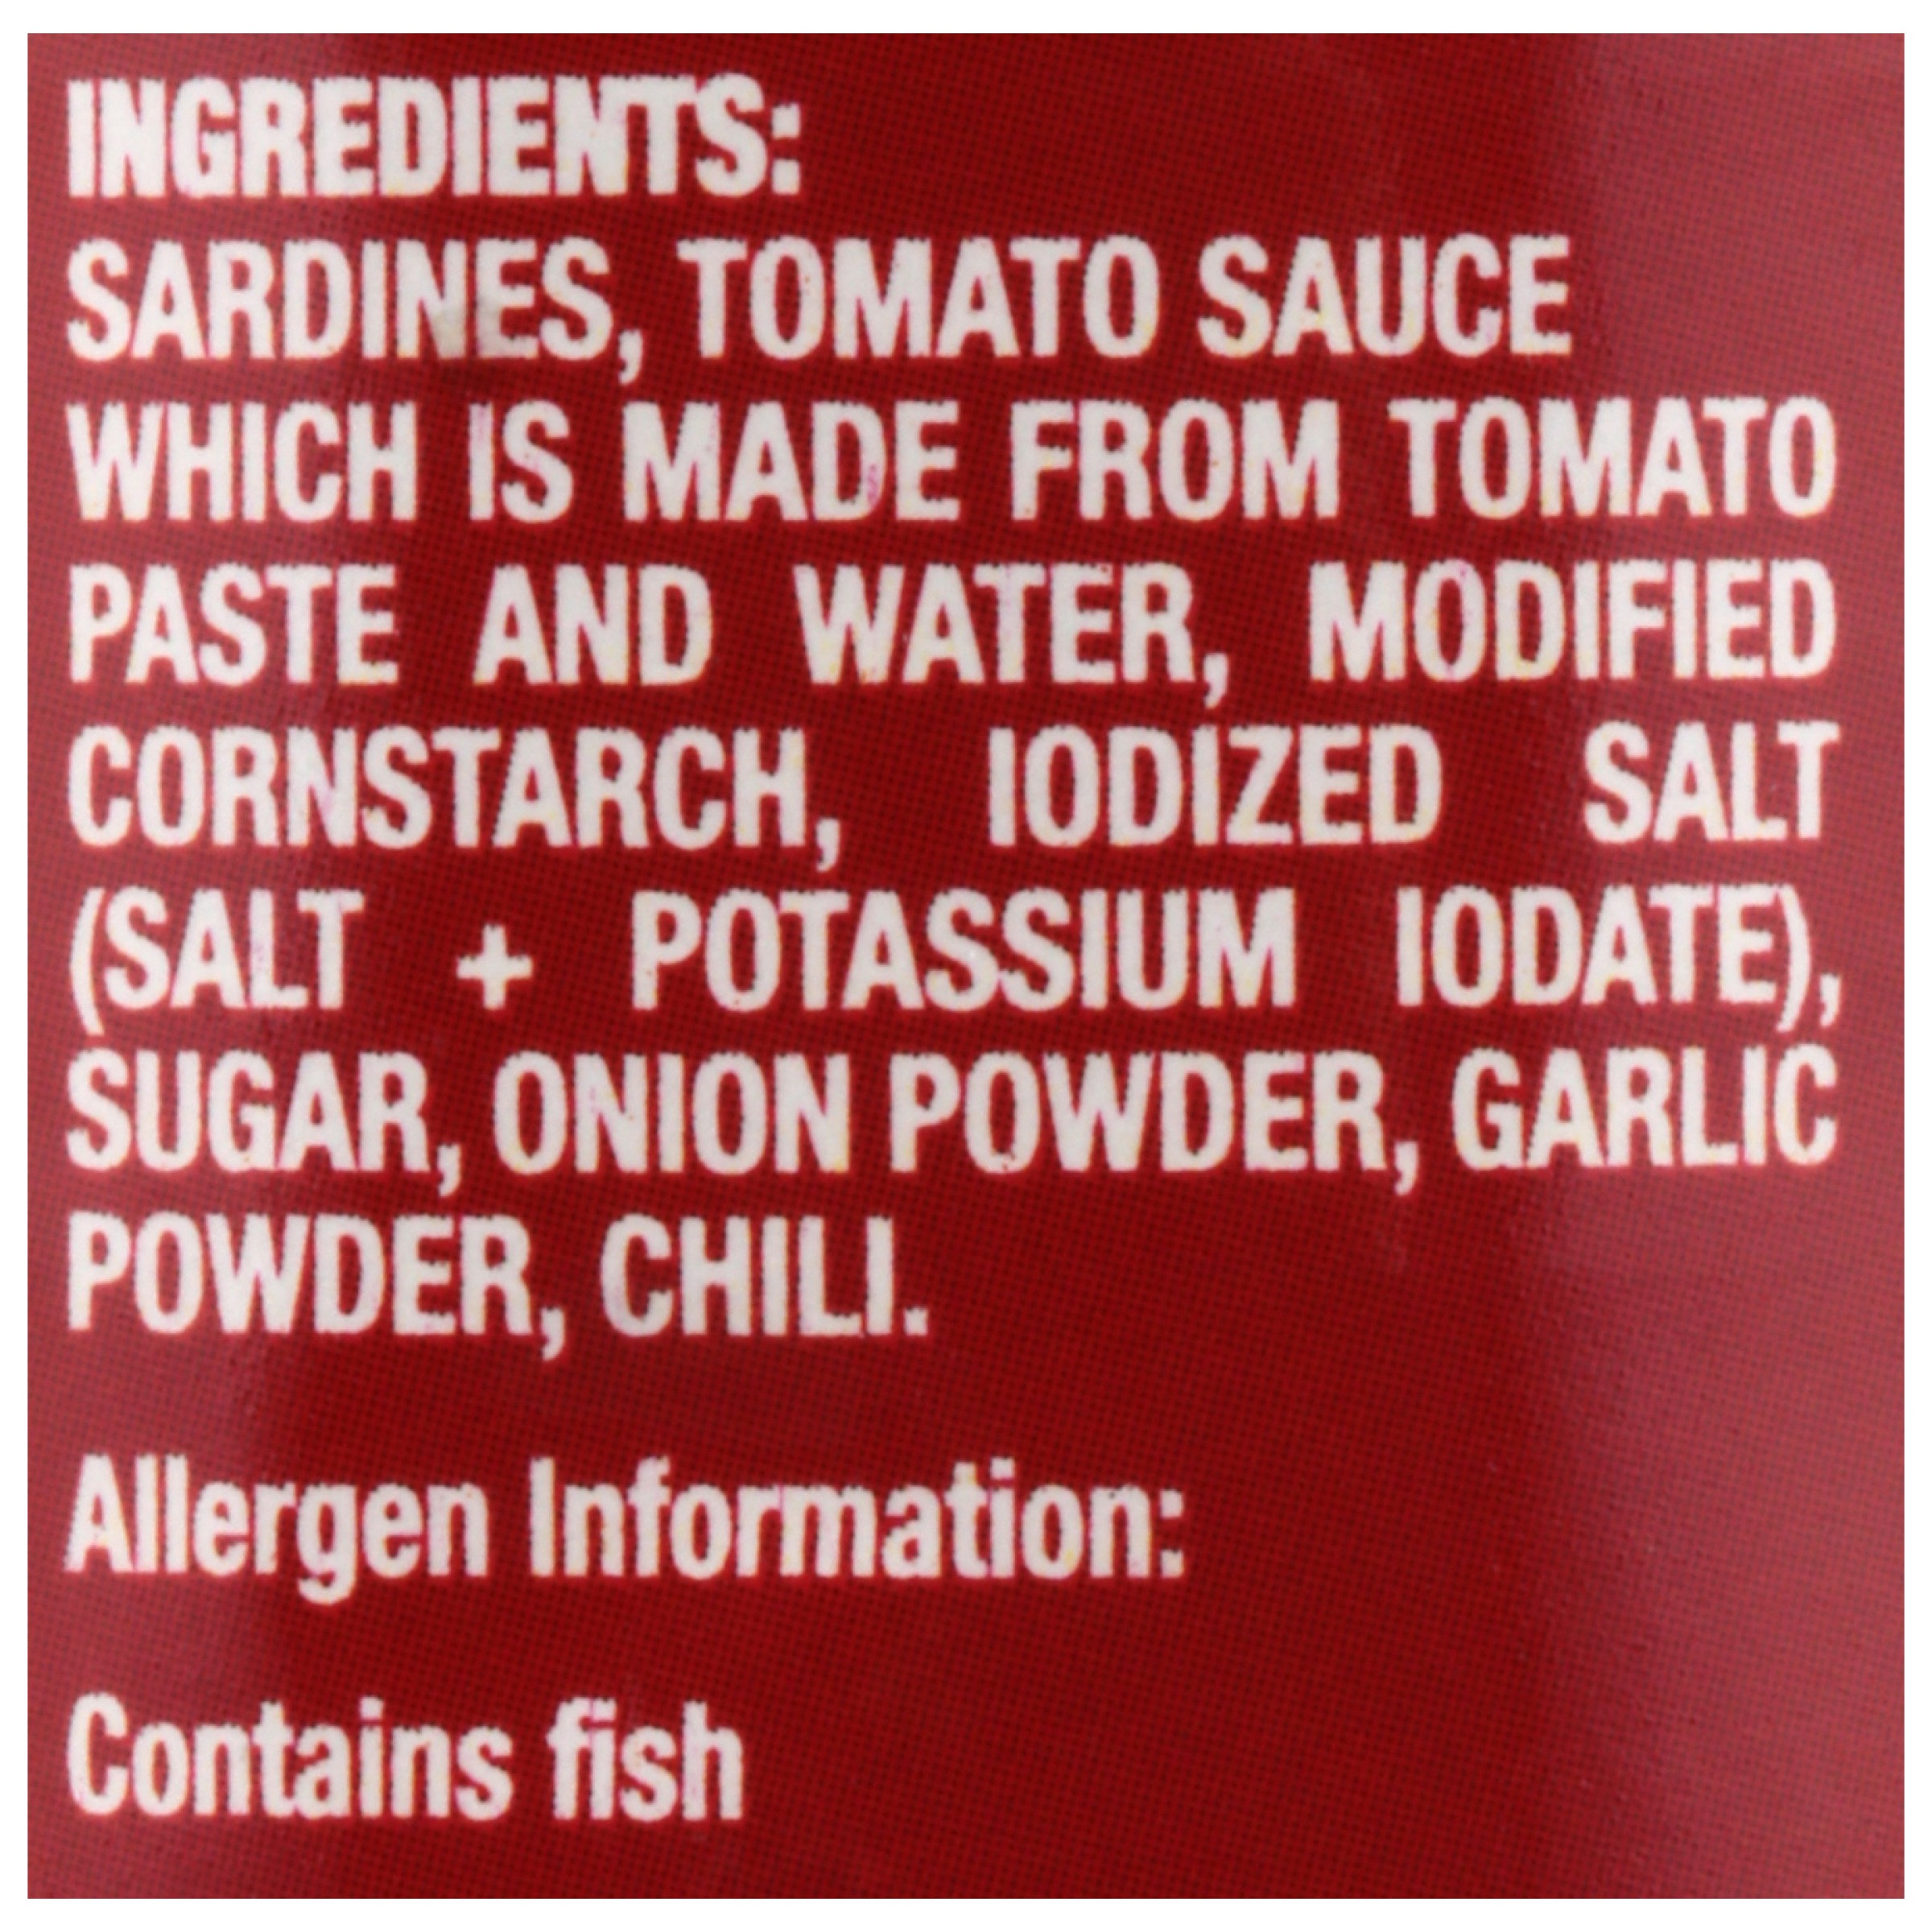 medium ligo sardines in tomato sauce chili added 55 oz T 0JUuFhOO